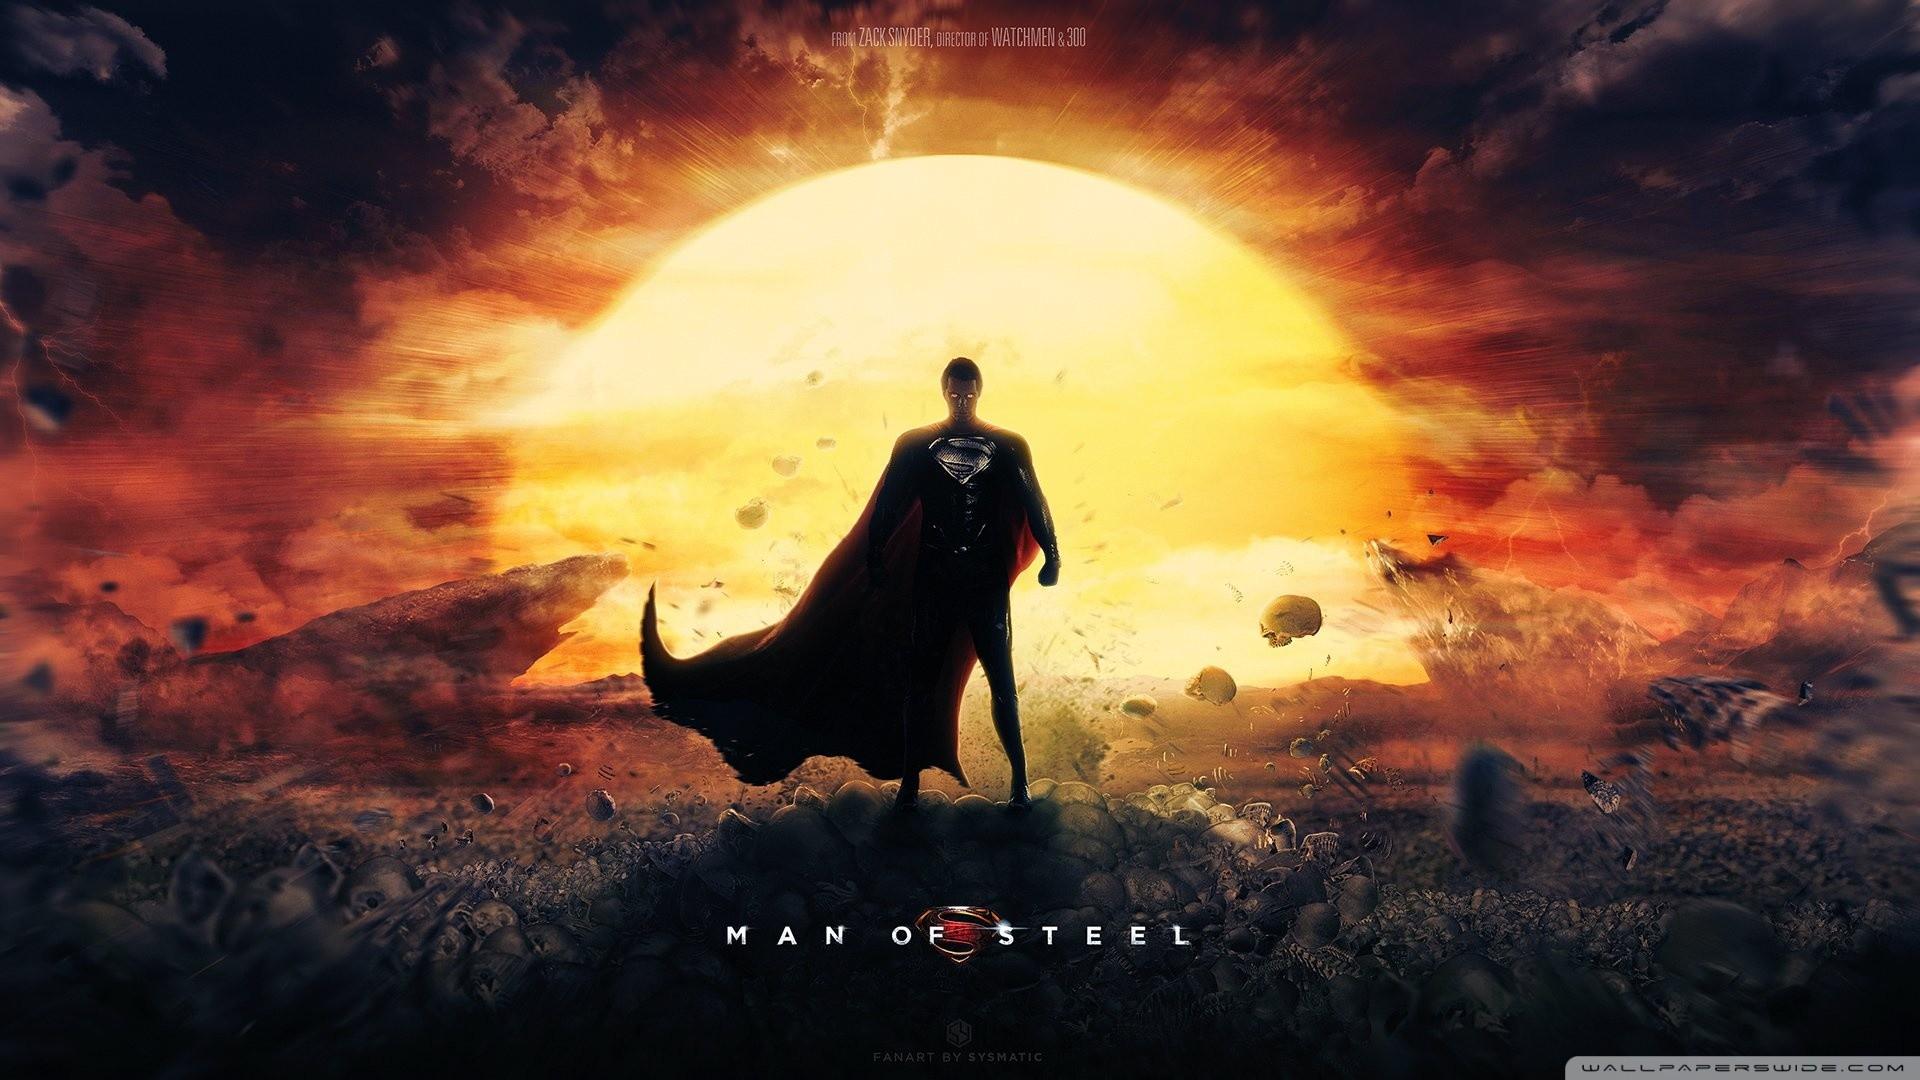 Man Of Steel Wallpaper Superman Movie HD Wide Wallpaper for Widescreen